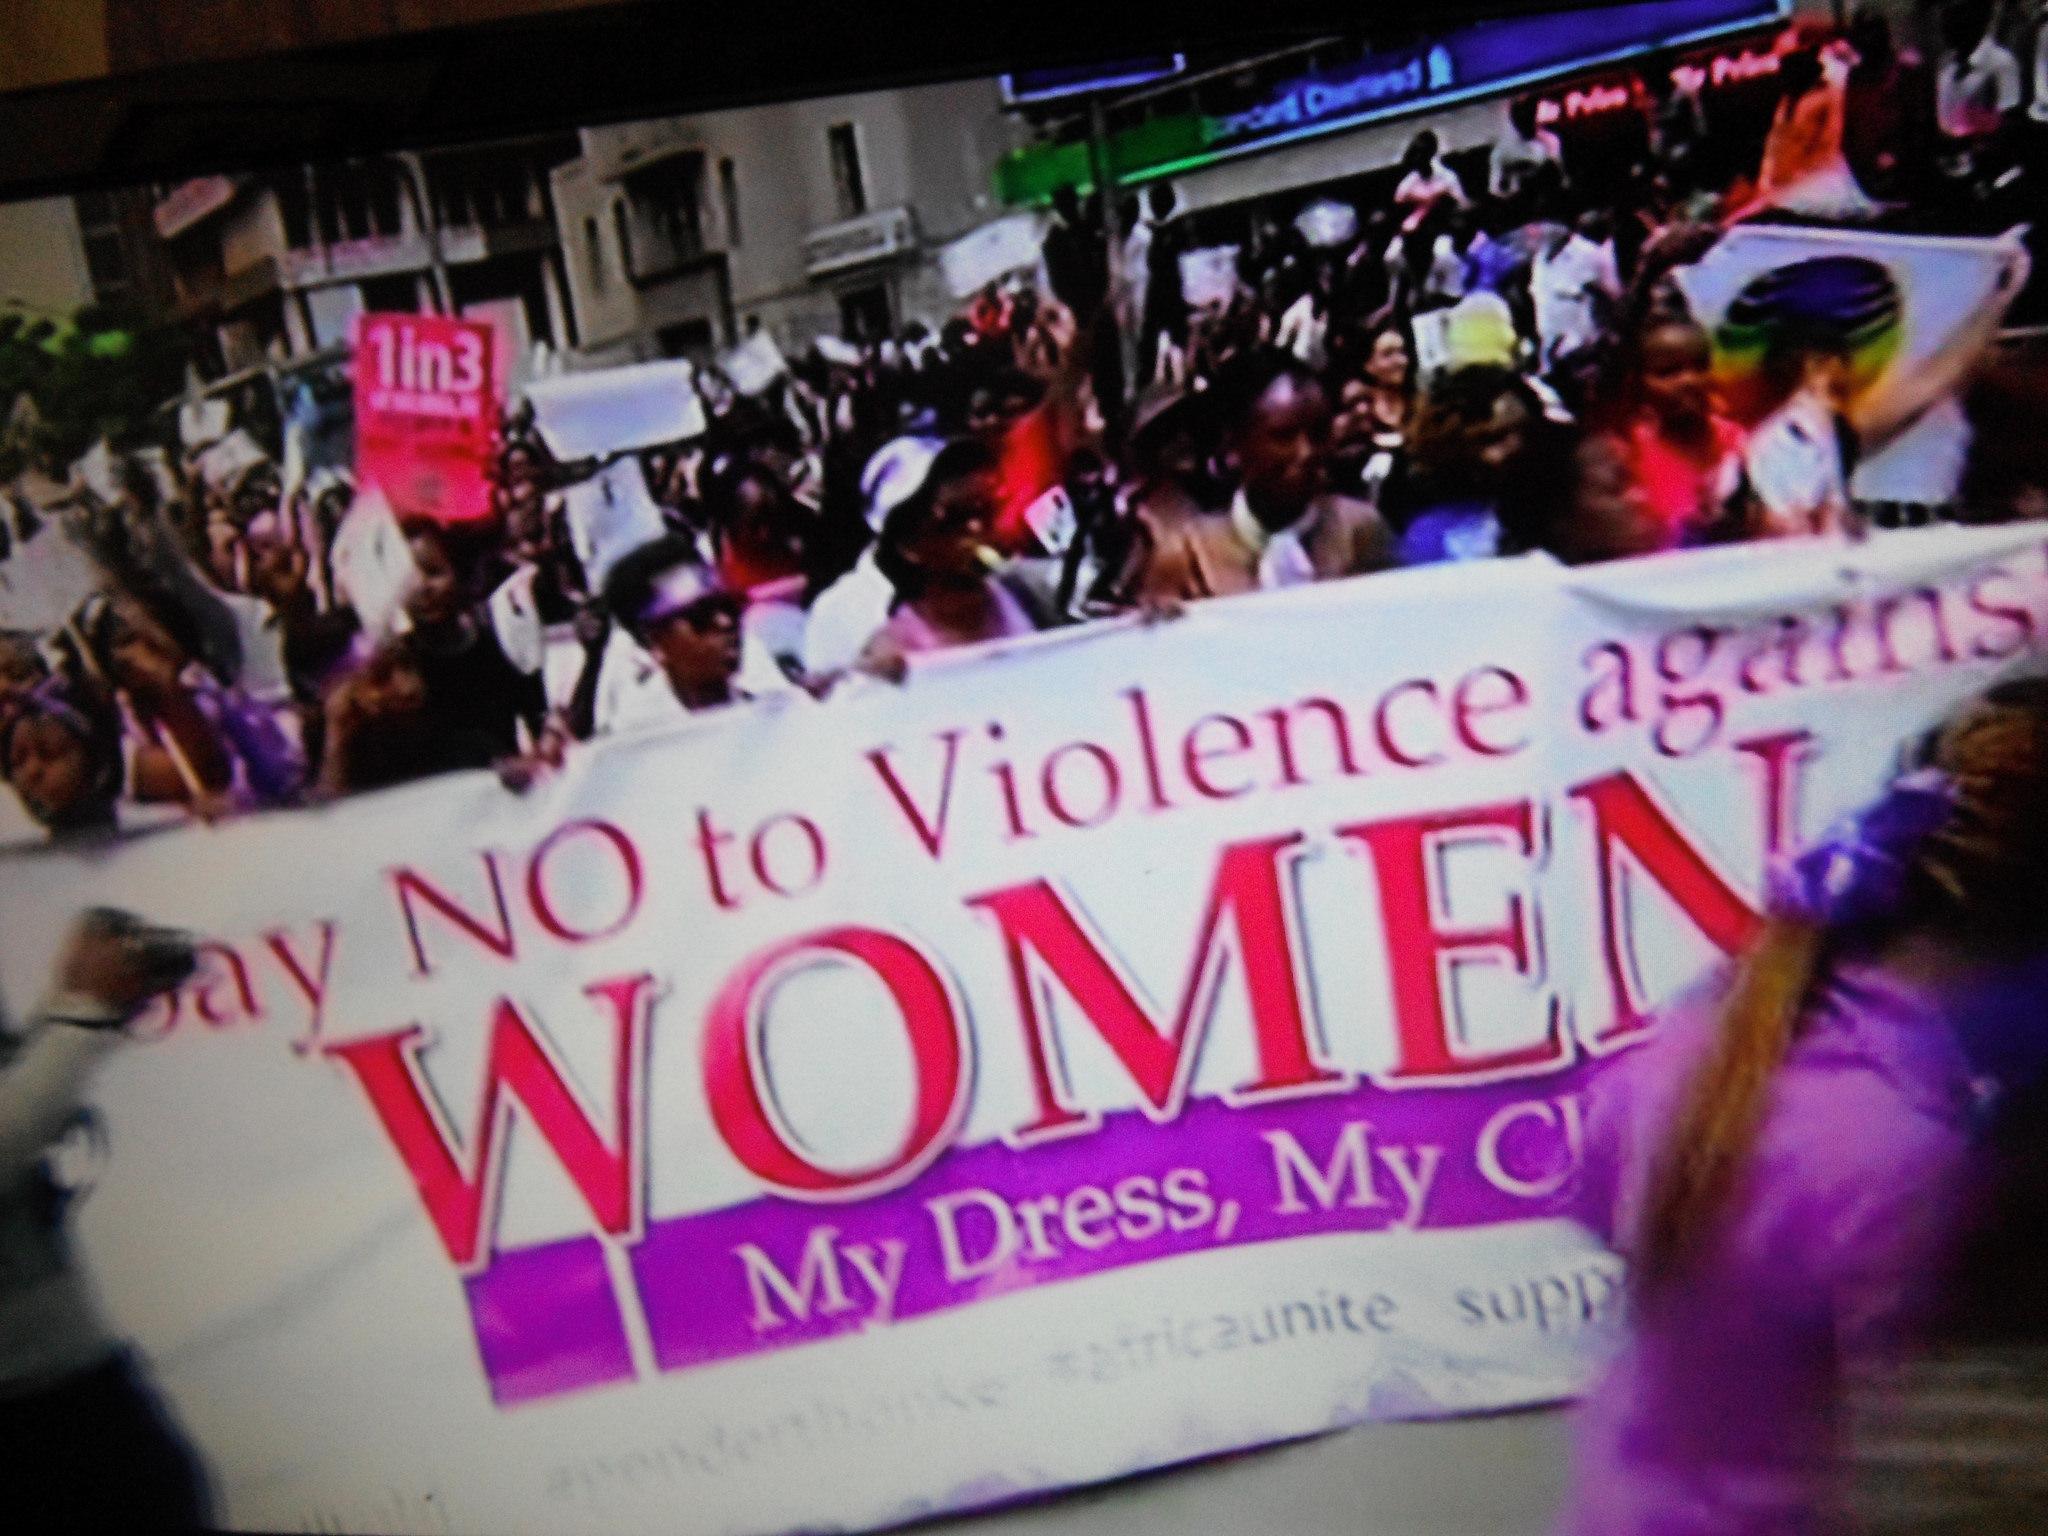 Violenza sulle donne le frasi più belle per combatterla